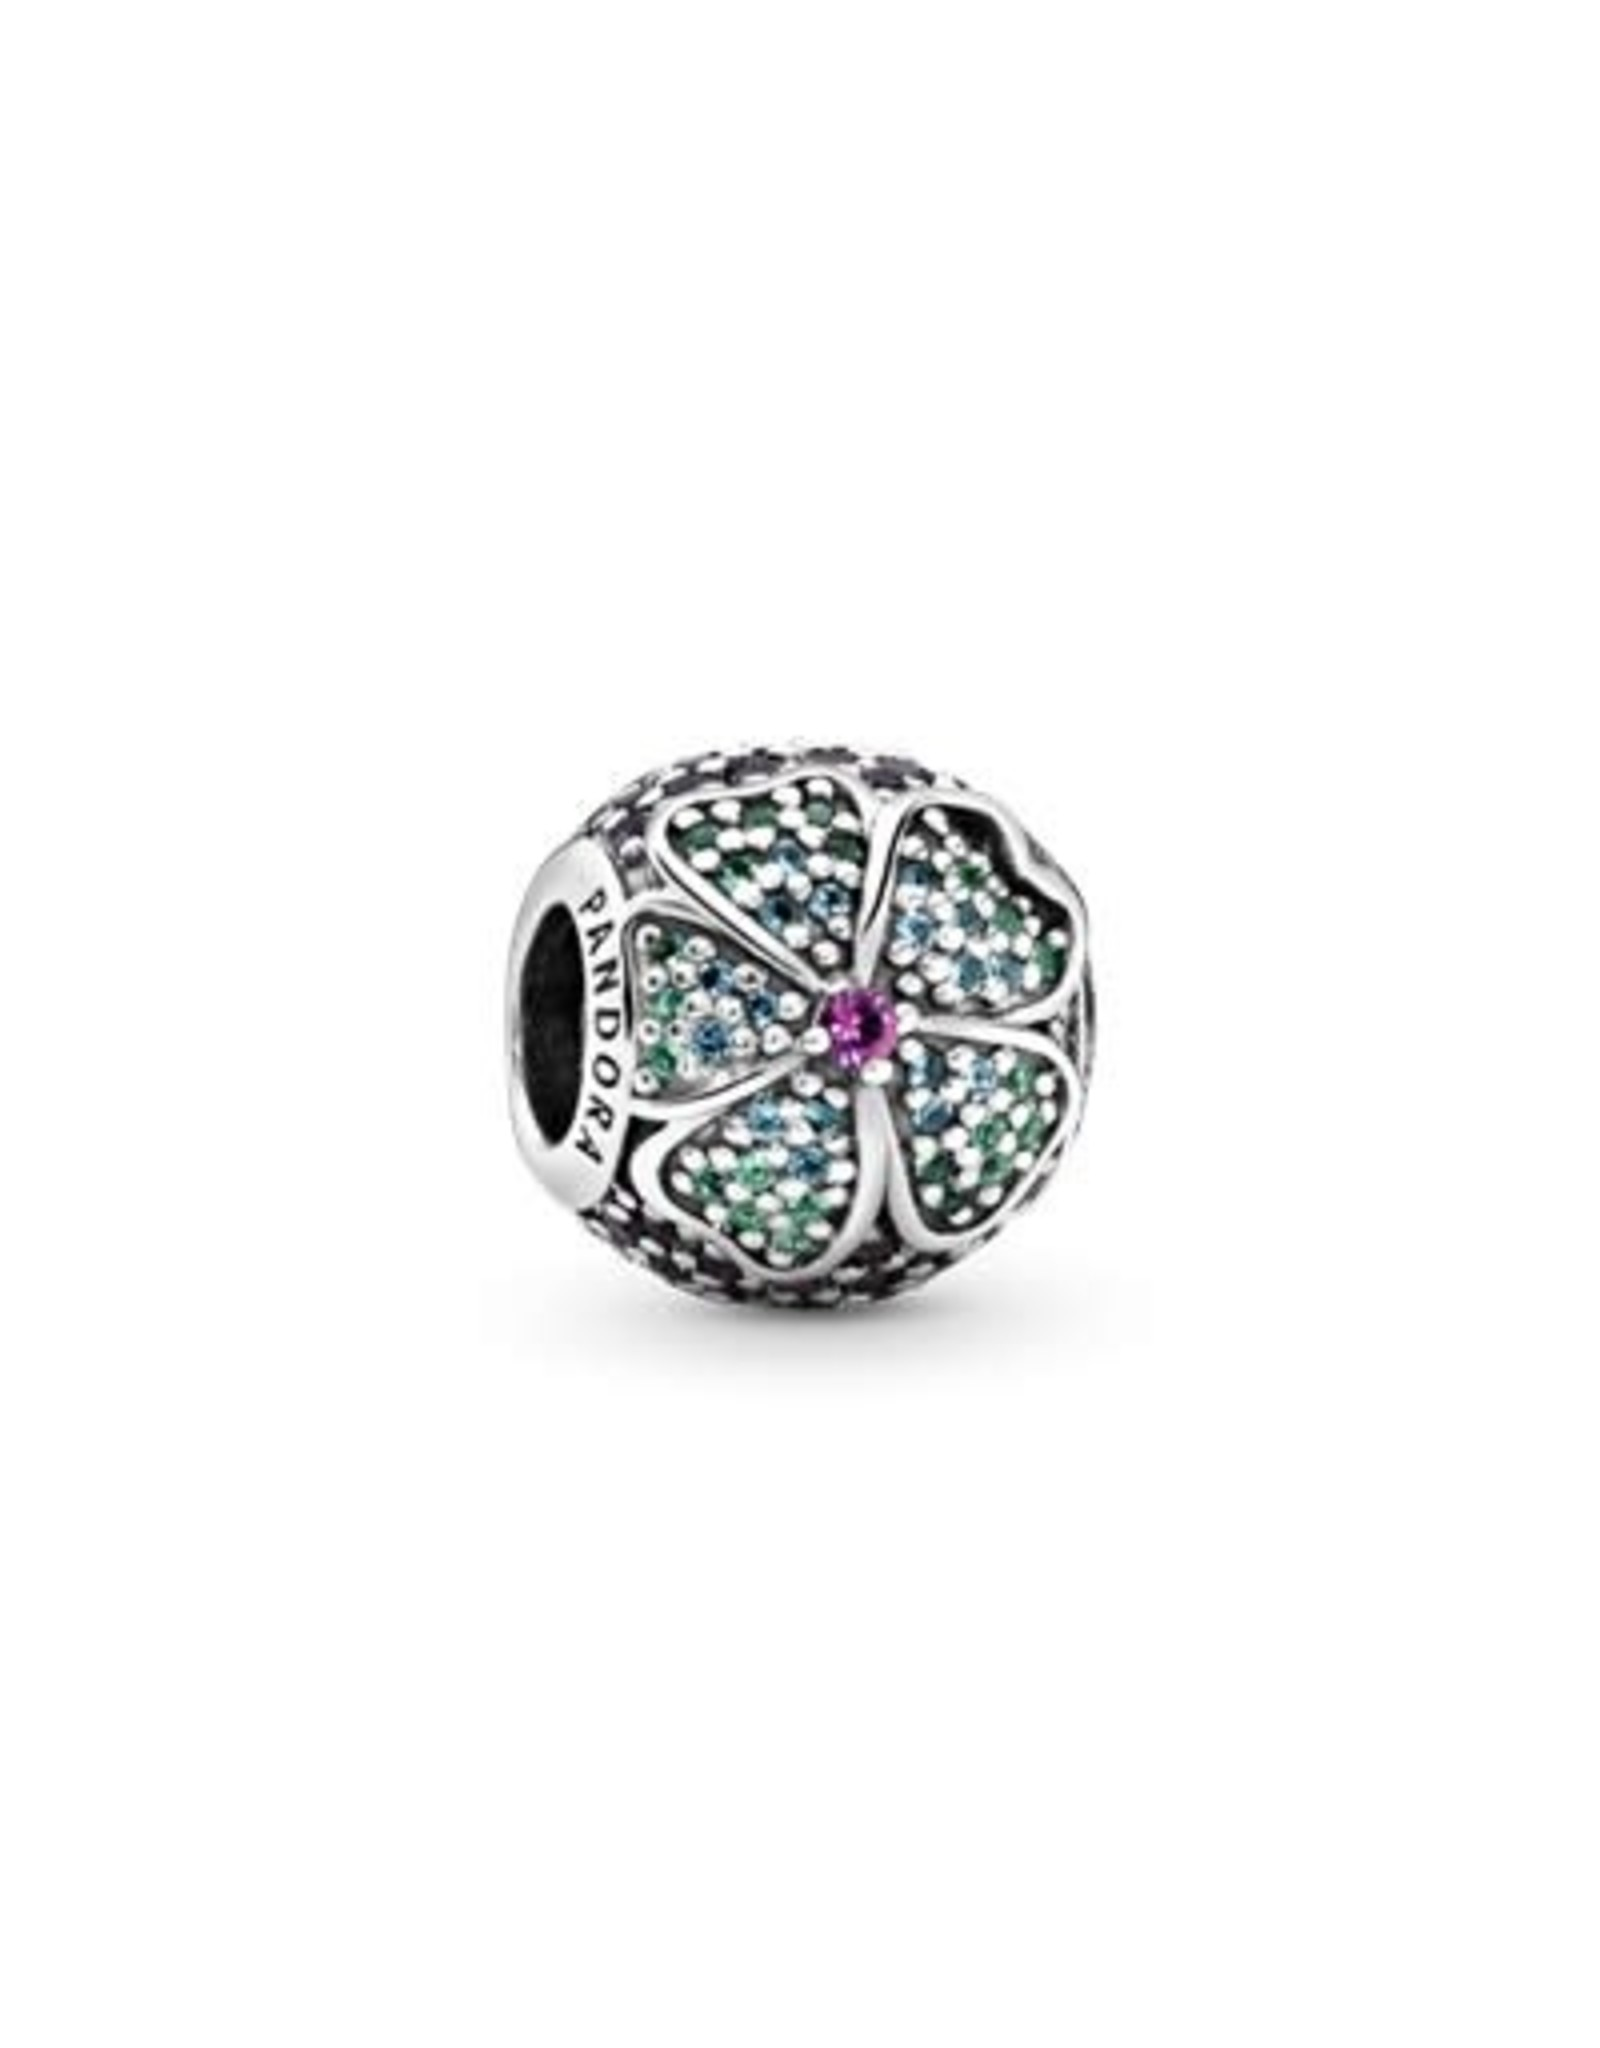 Pandora Pandora Charm, Glorious Blooms, Multi-Colored Crystals